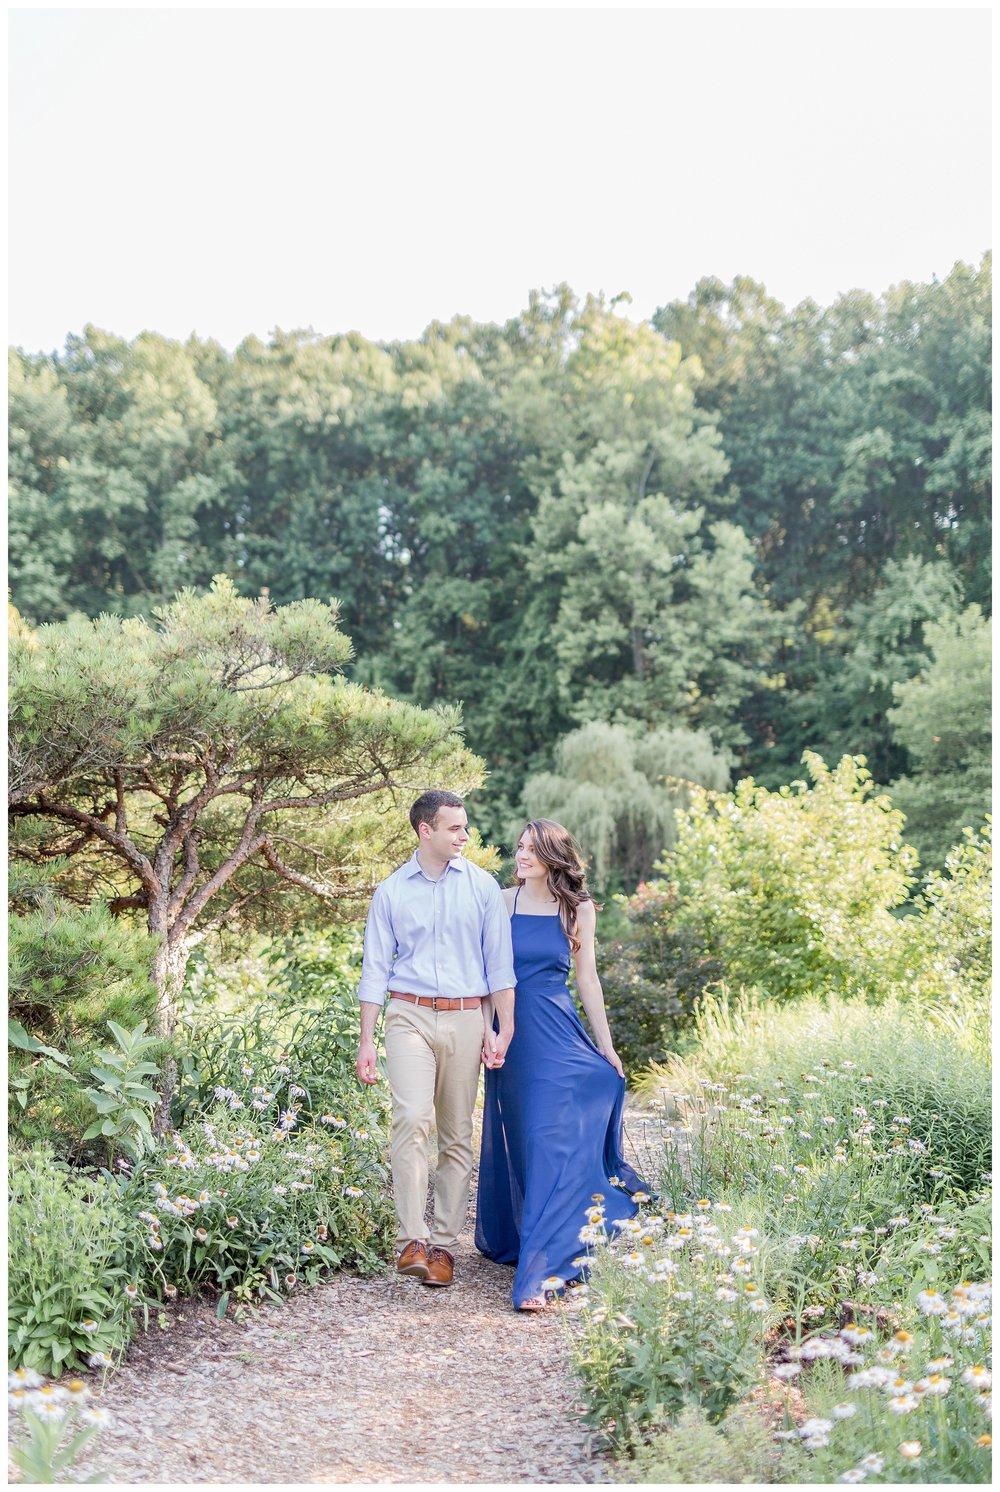 Meadowlark Botanical Garden Engagement | Virginia Wedding Photographer Kir Tuben_0017.jpg